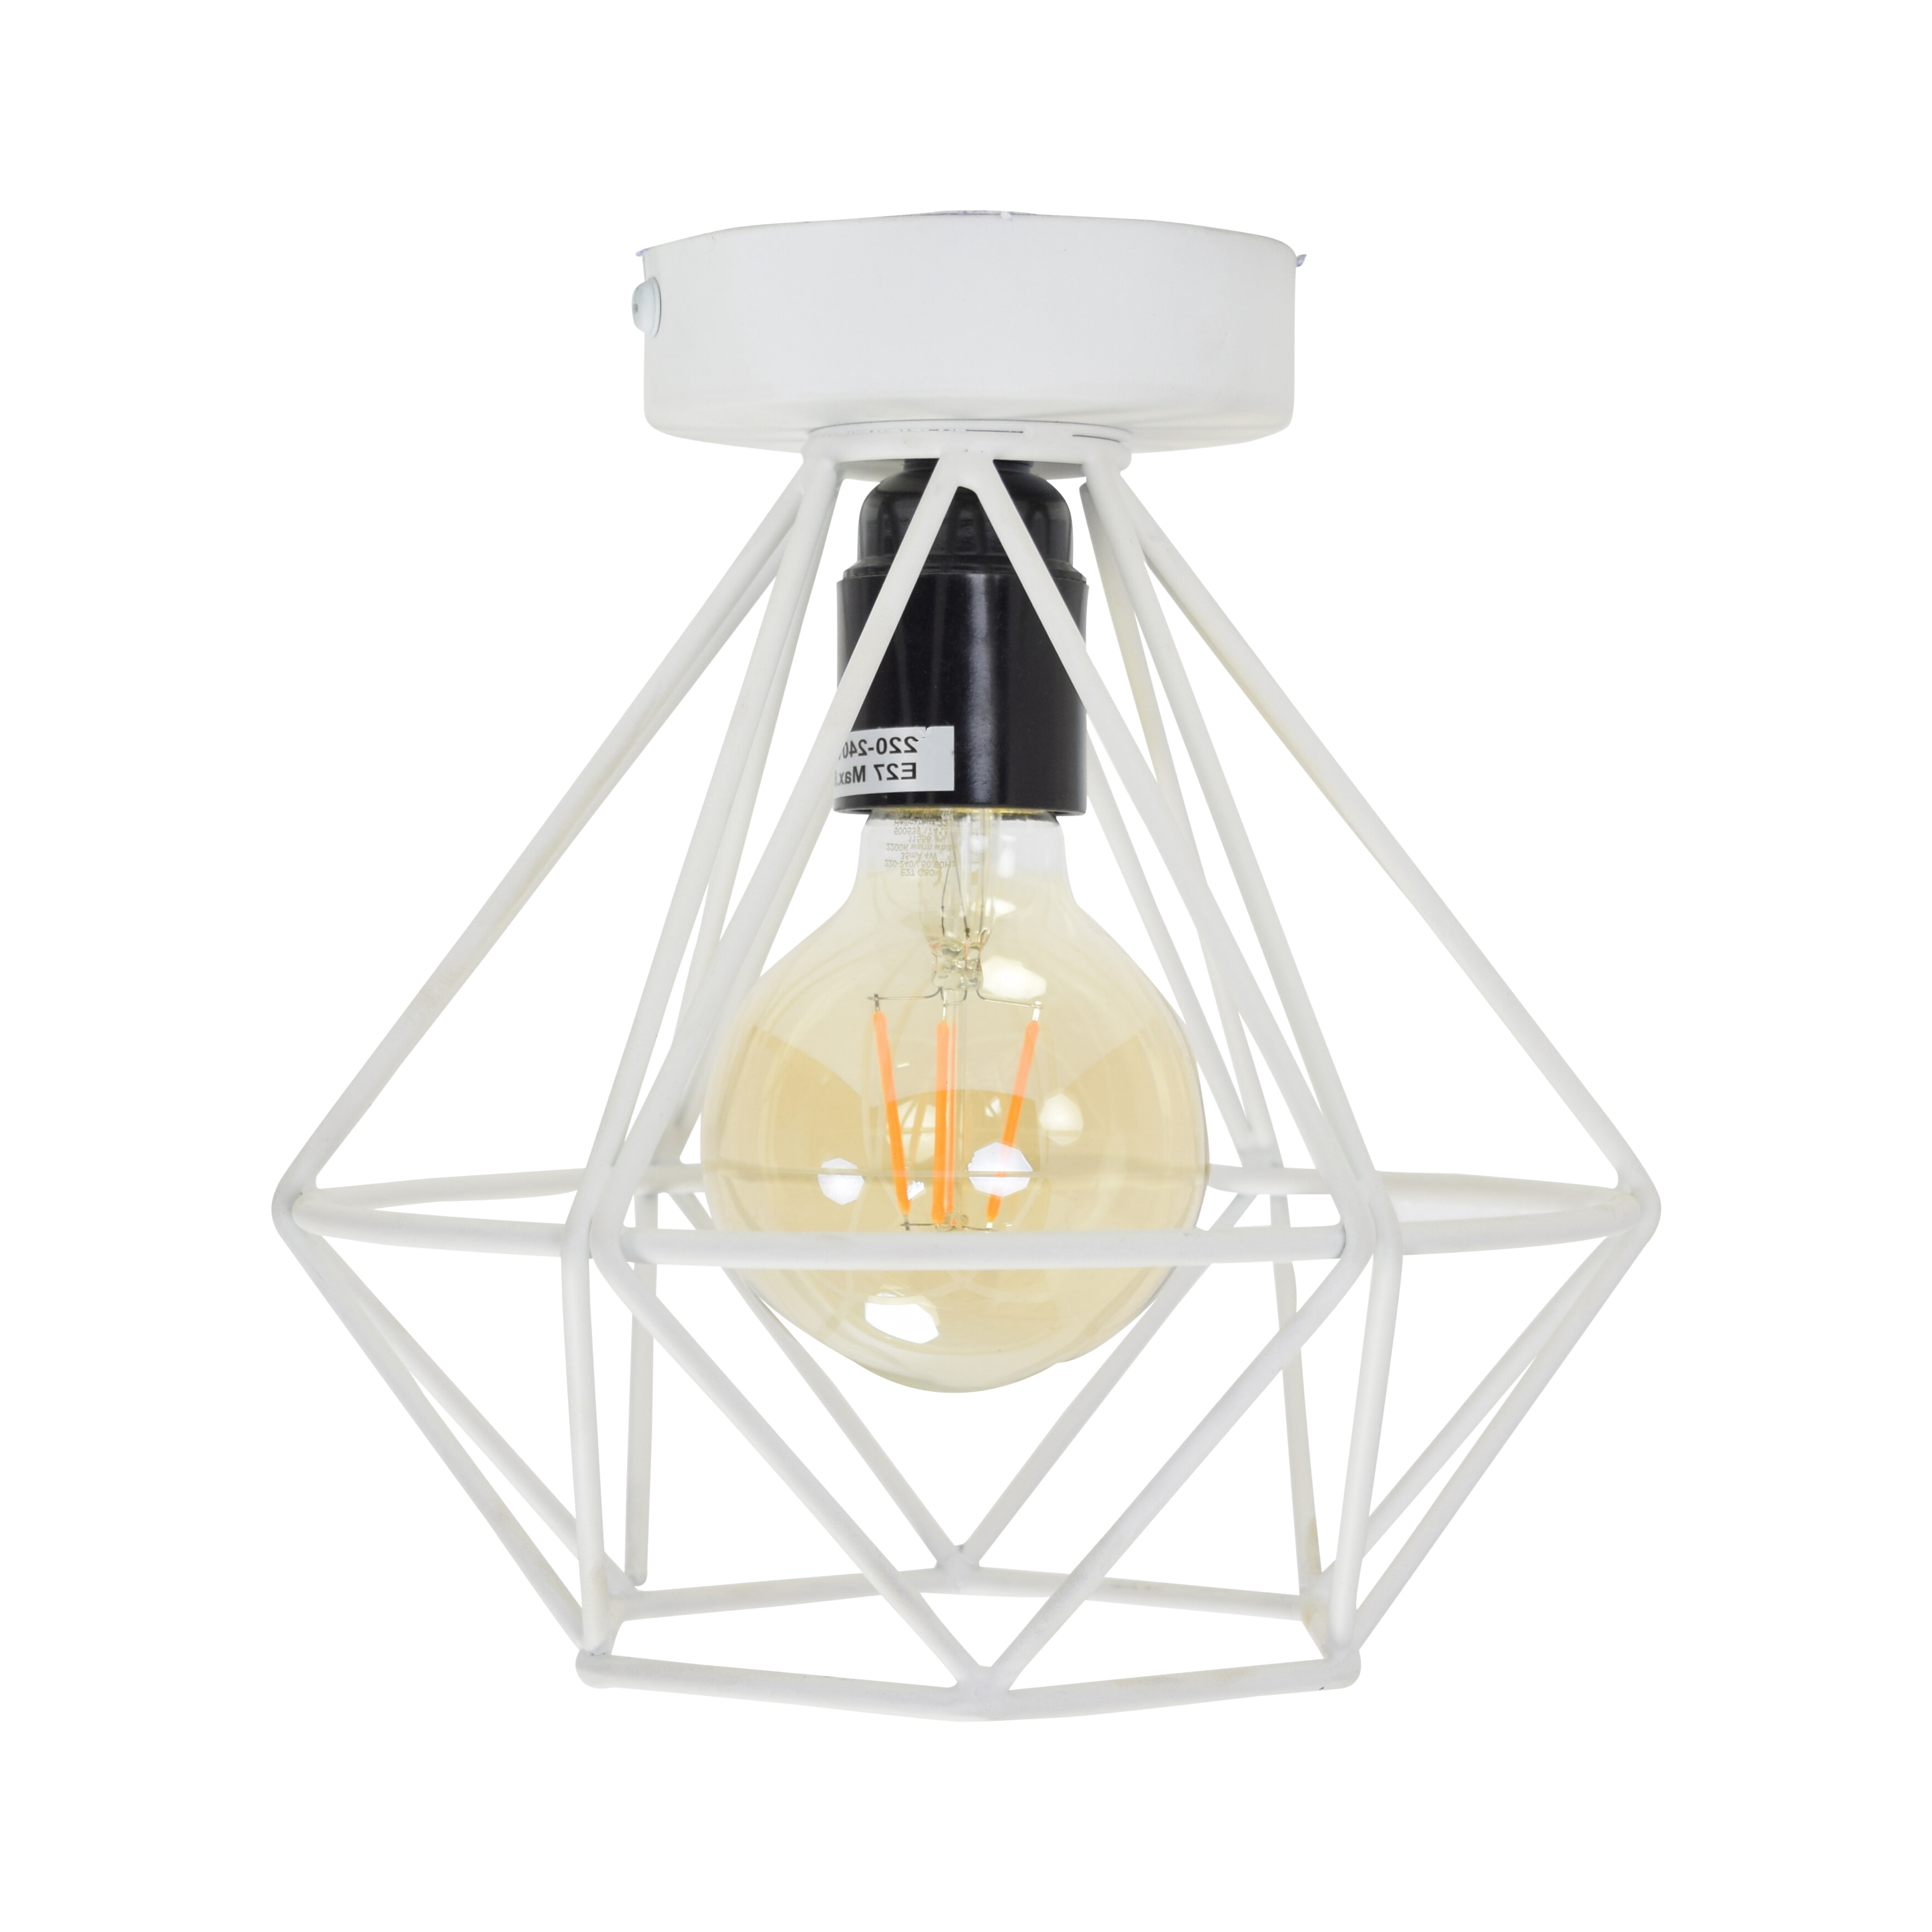 Urban Interiors plafondlamp 'Wire .' Ø22cm, kleur Mat Wit